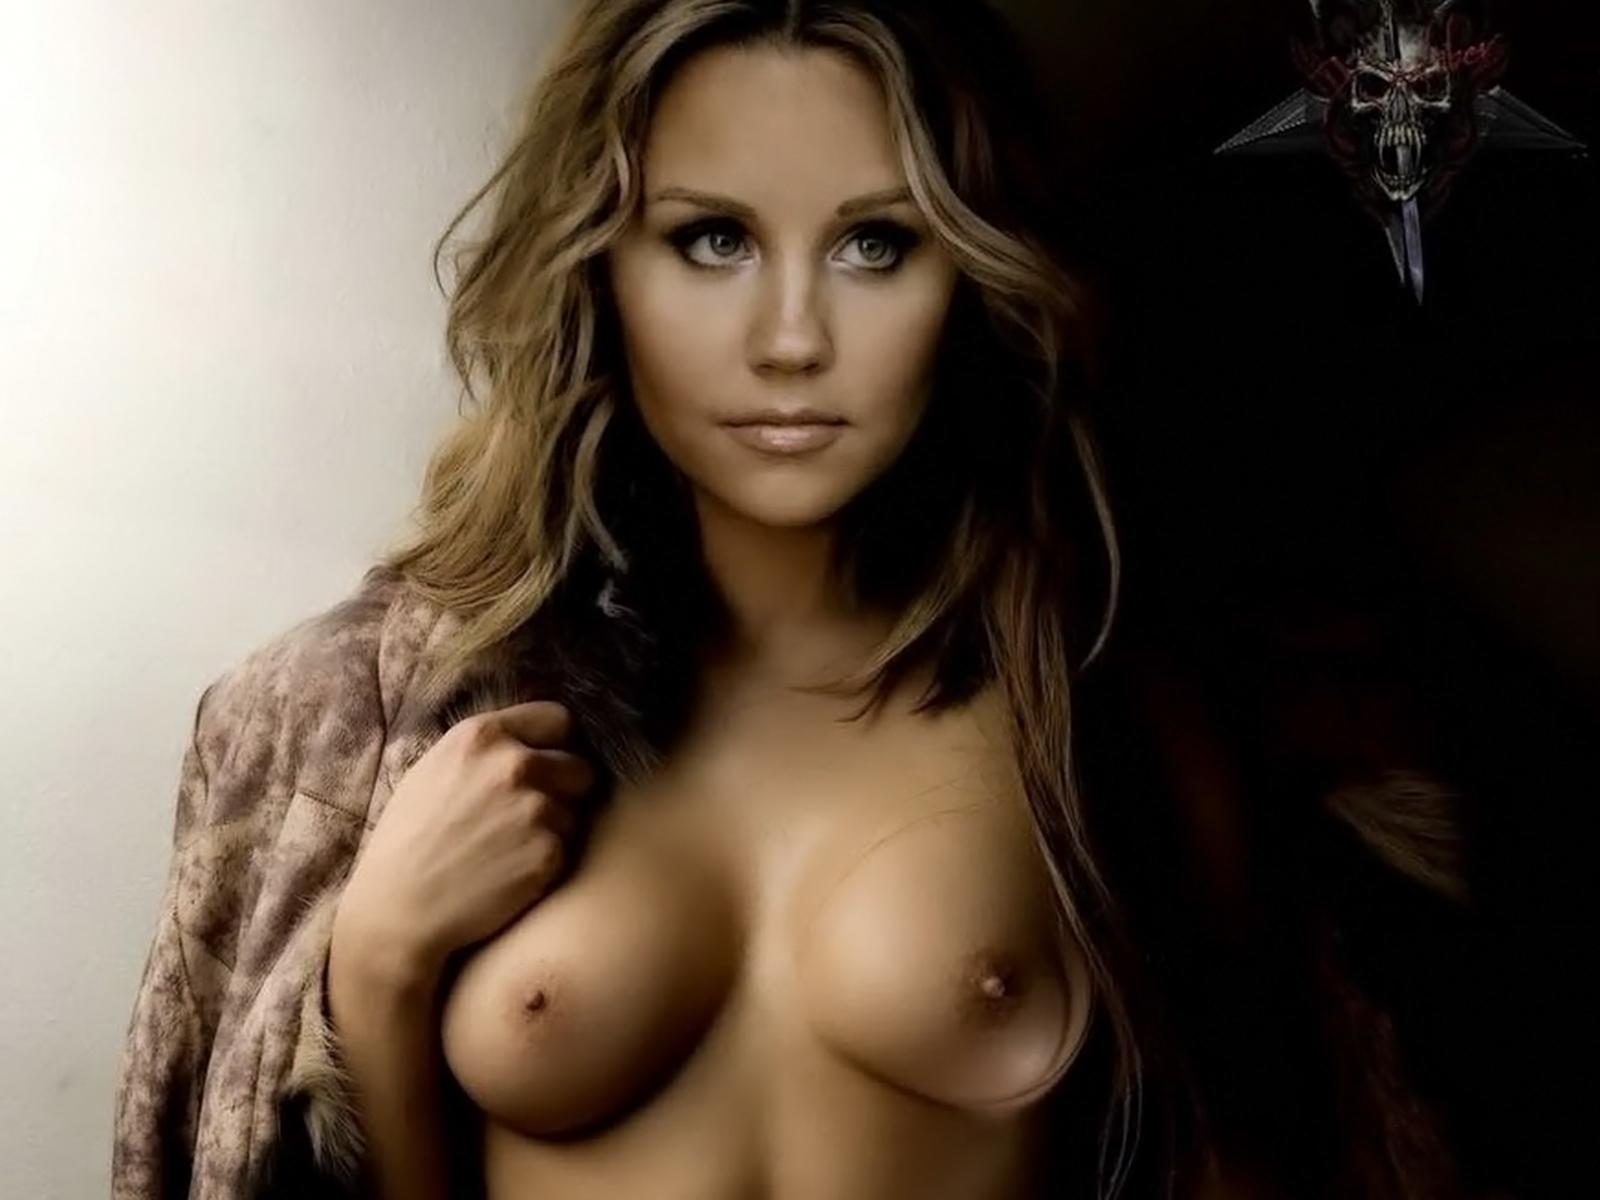 amanda bynes nude hot topless